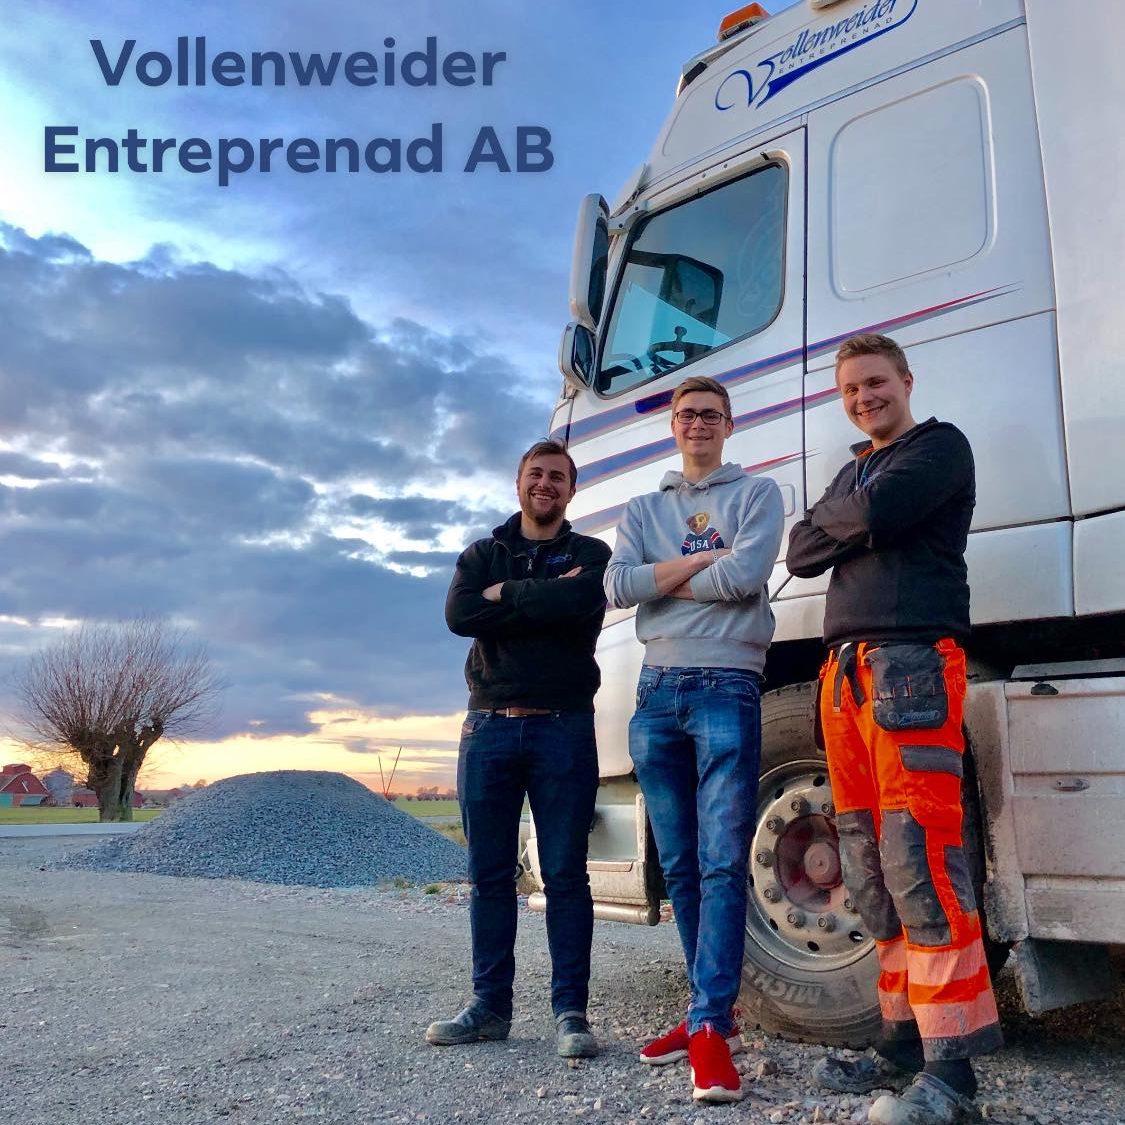 IMG_6988Vollenweider Entreprenad AB